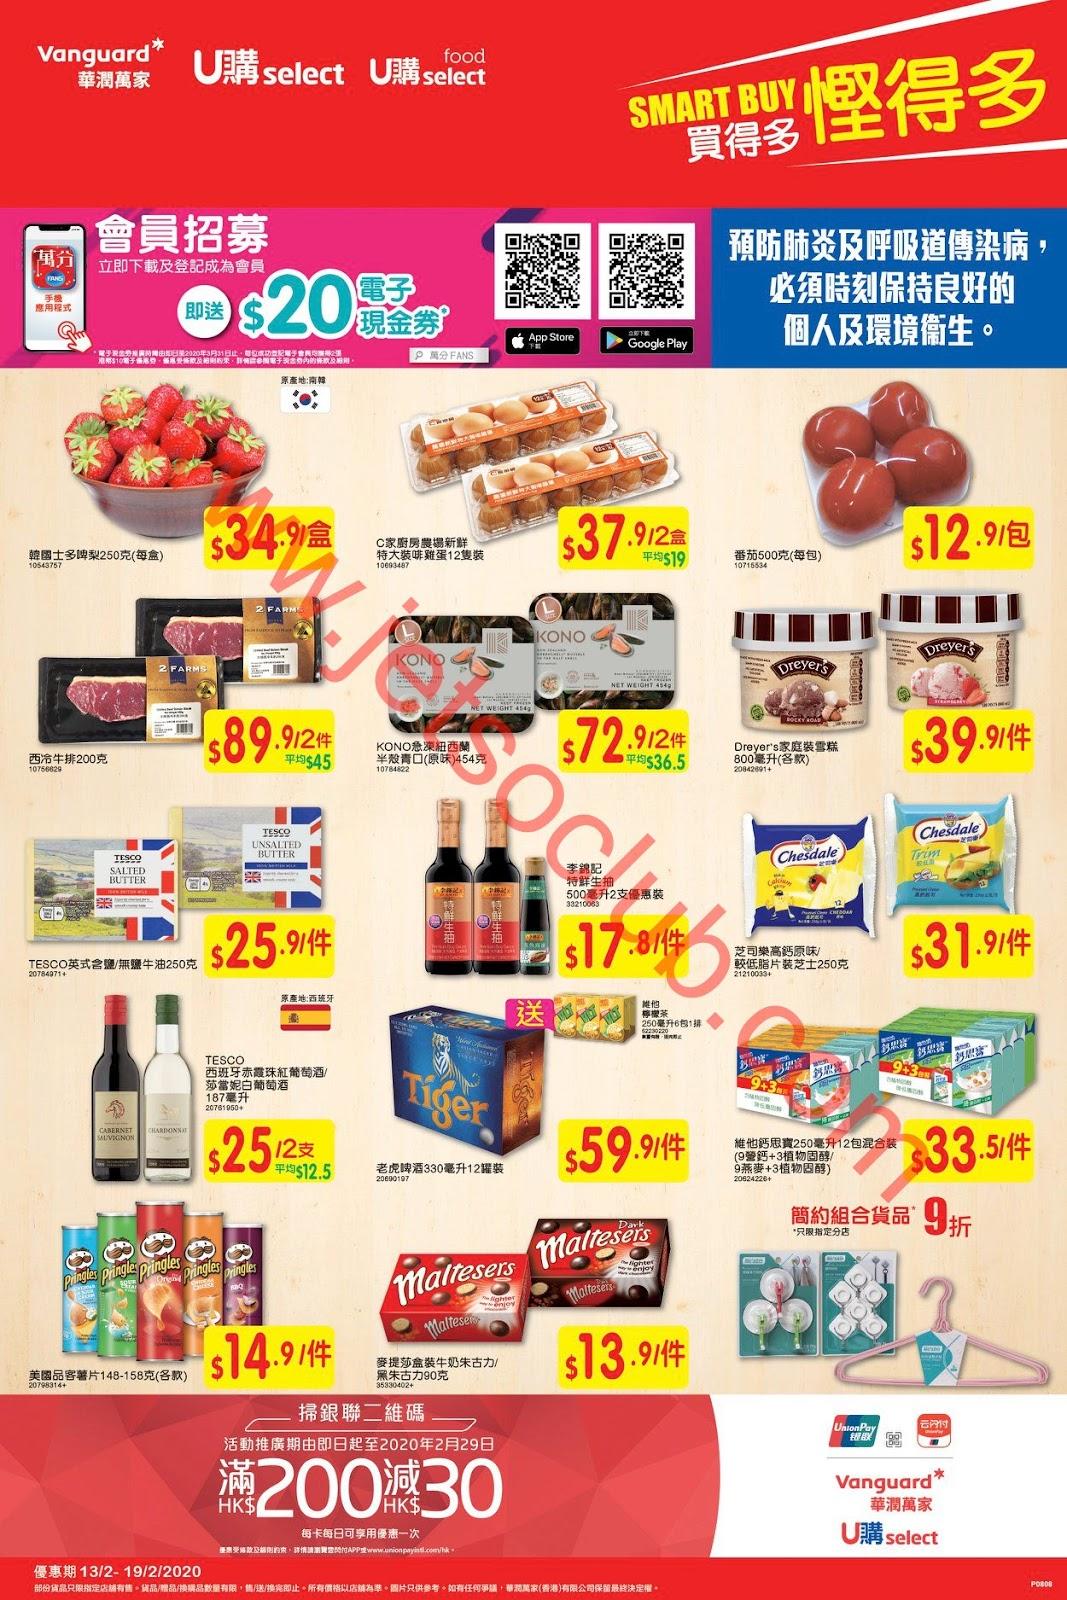 U購 select / 華潤萬家超級市場最新優惠(14/2) ( Jetso Club 著數俱樂部 )